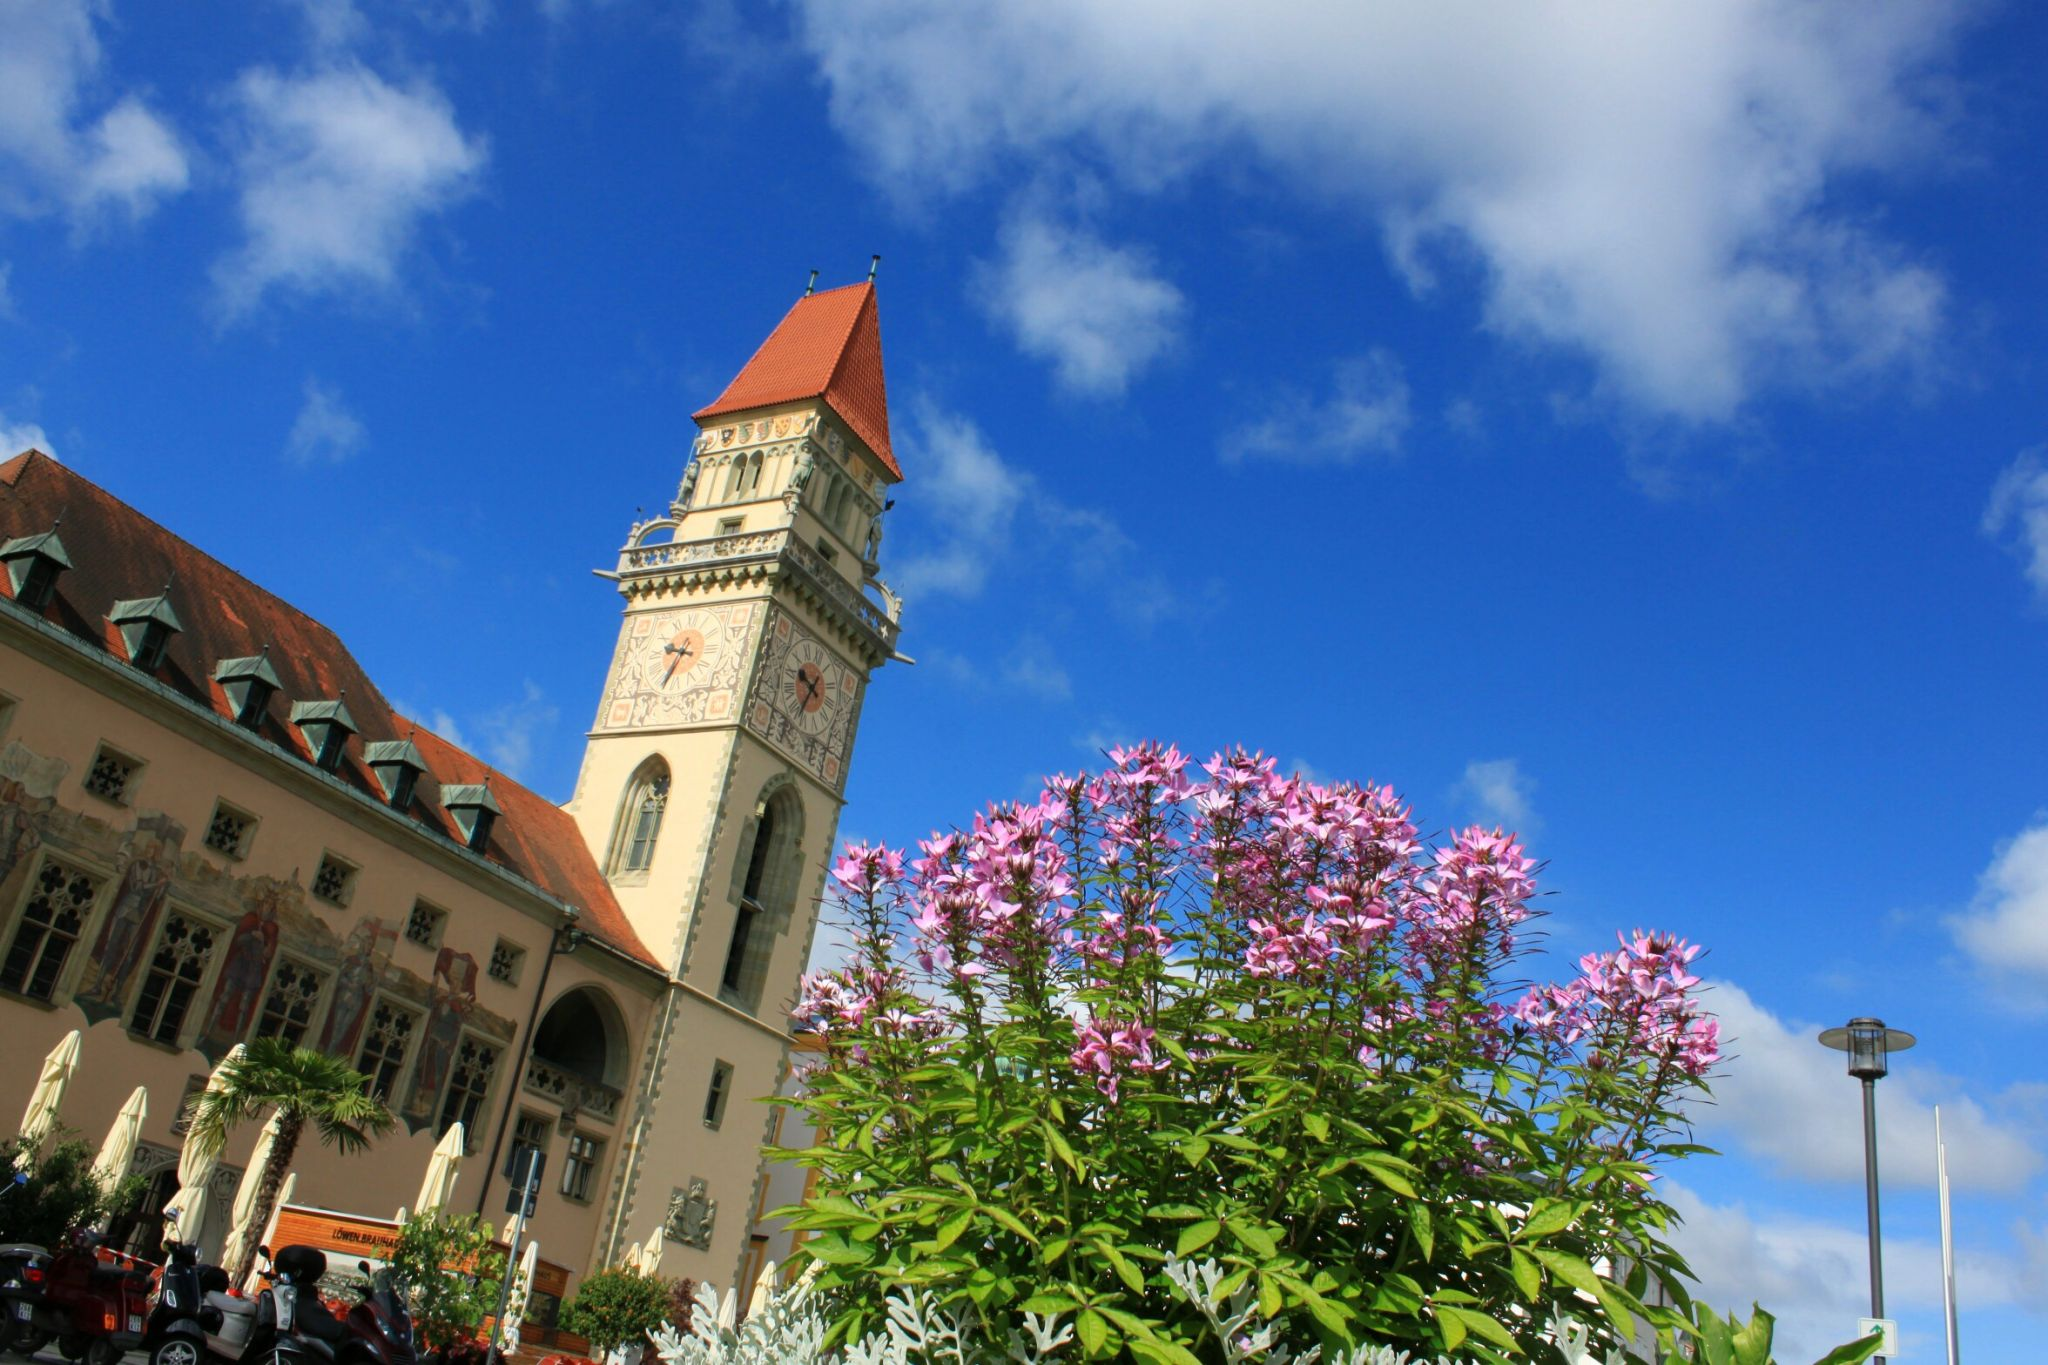 Rathaus, Passau, Germany